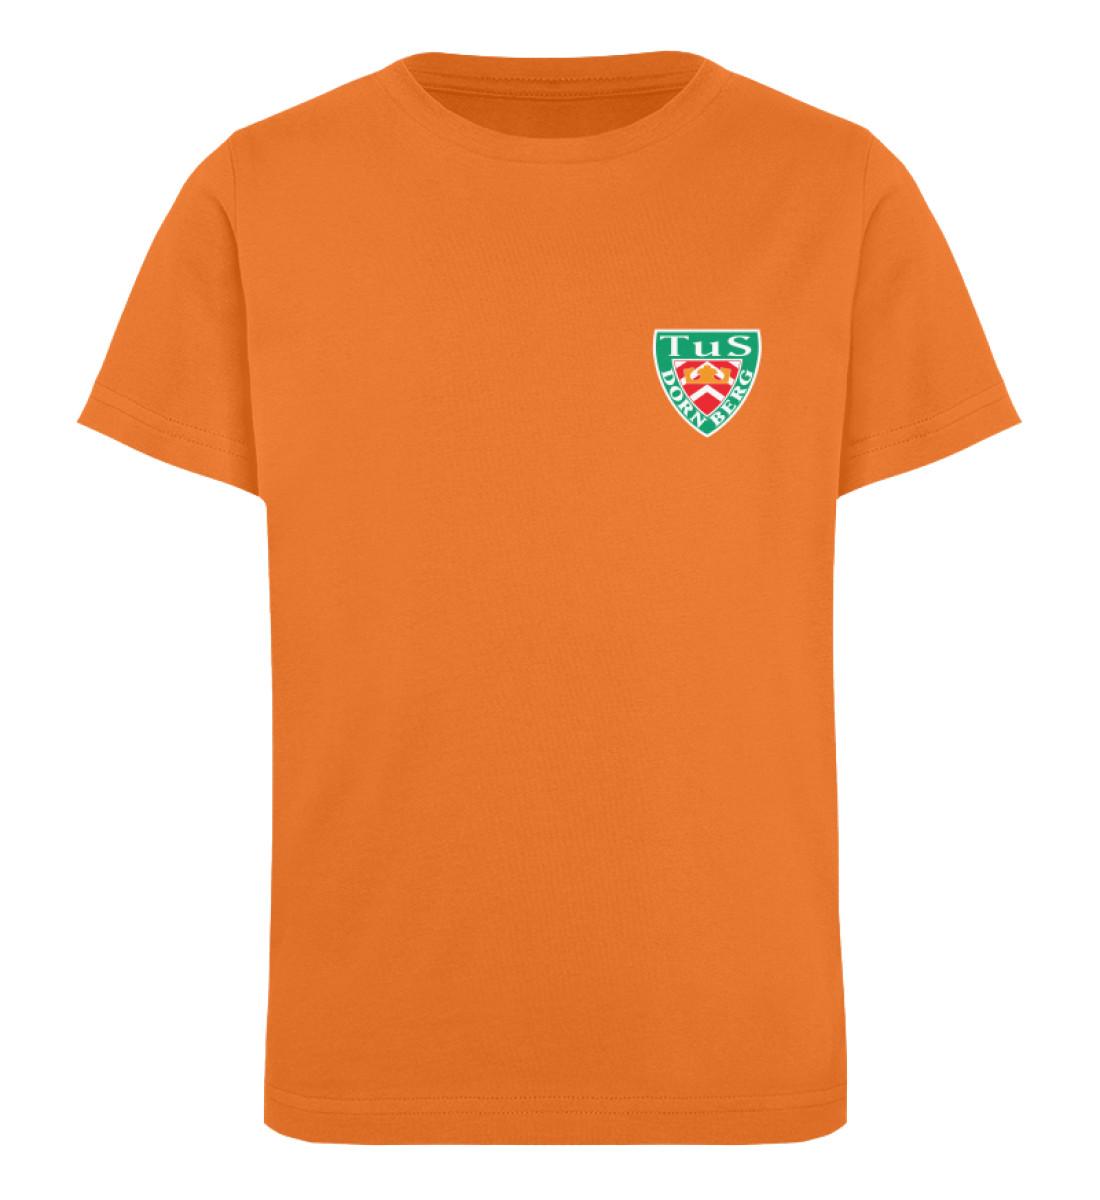 Dornberg - Kinder Organic T-Shirt-6902